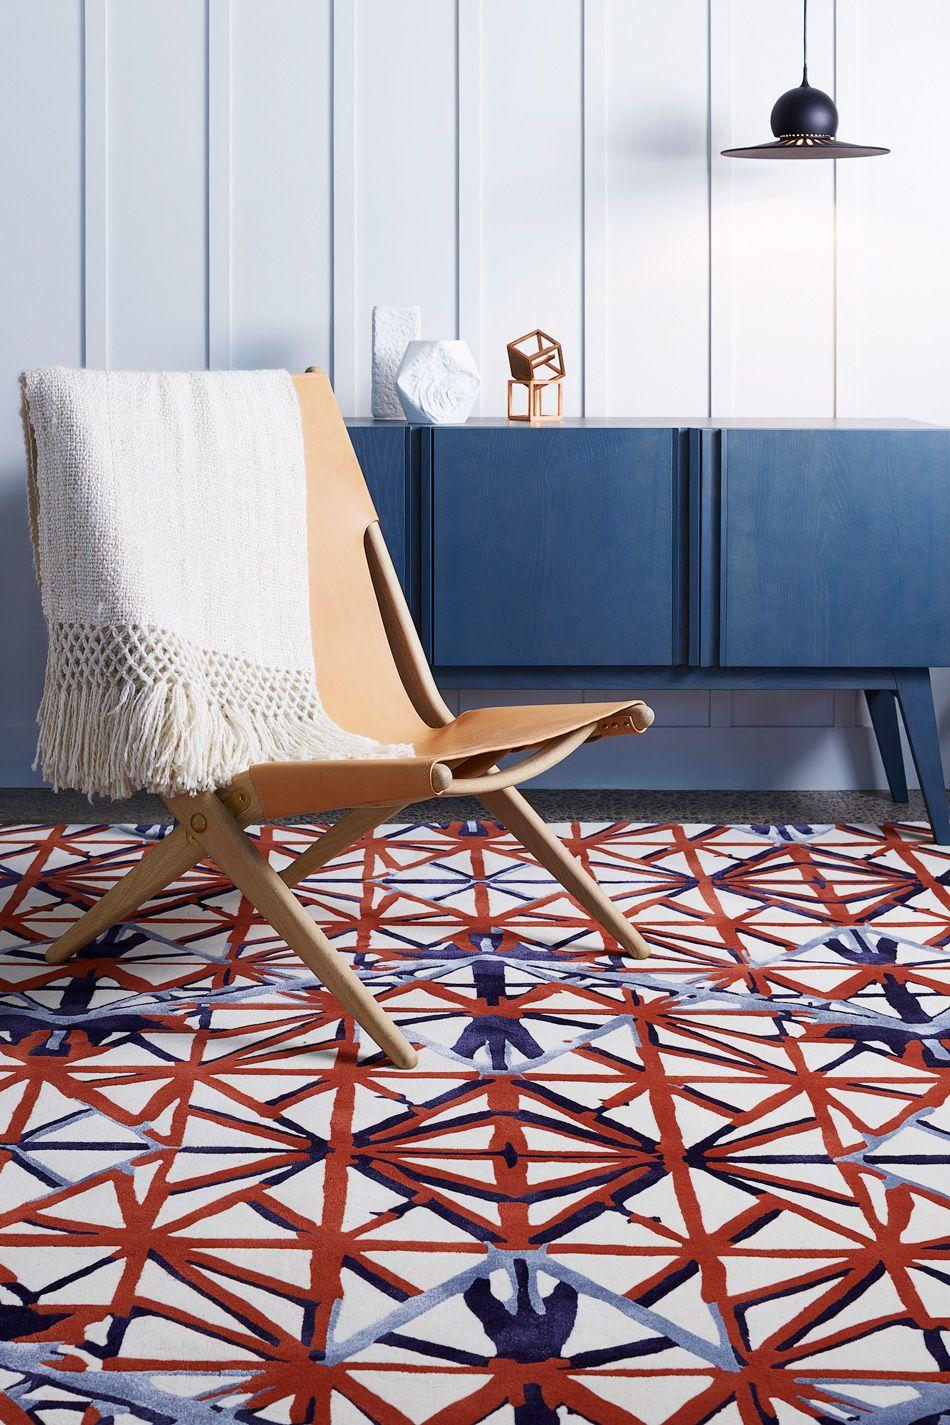 Designer Rugs Design Addicts Platform Australia S Most Popular Industry Interior Design Architecture Styling Blog Rugs Living Room Carpet Chair Design